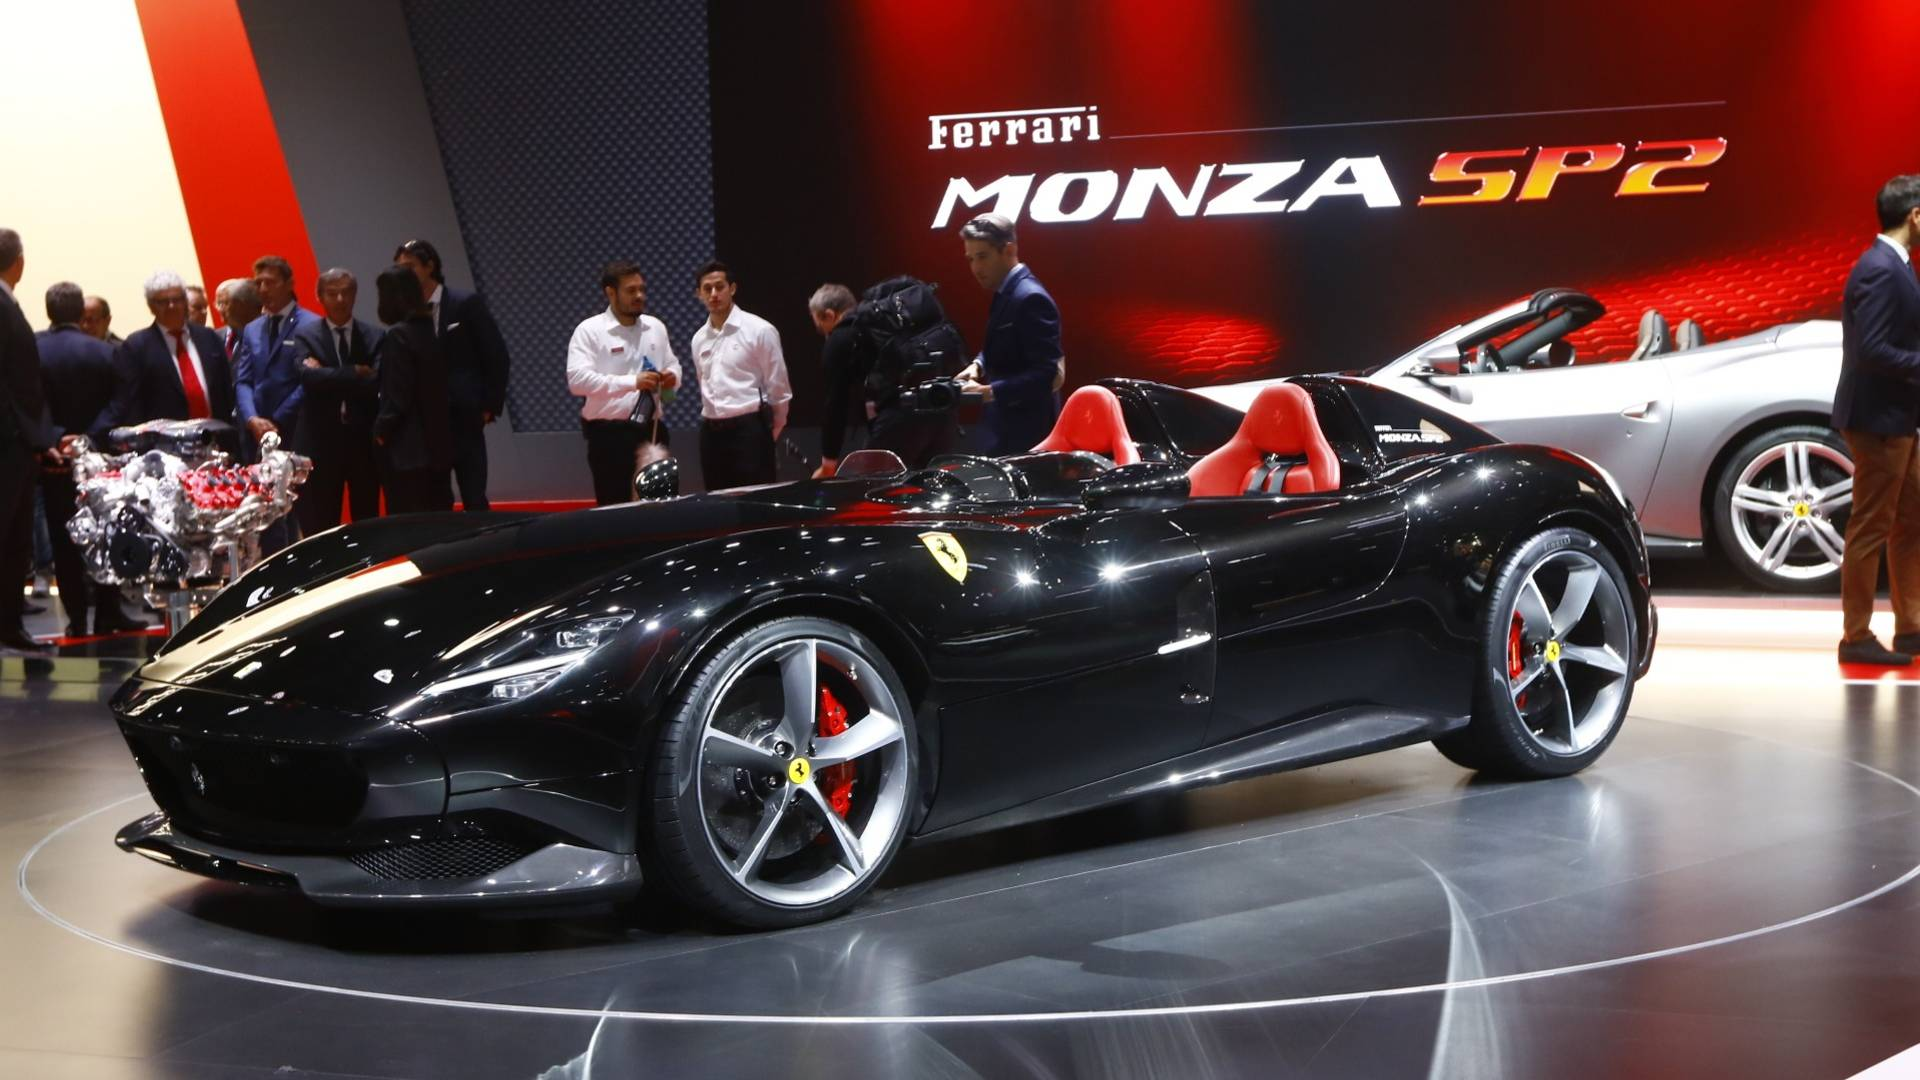 Ferrari Drops Stunning Promos For Monza SP1, SP2 Speedsters